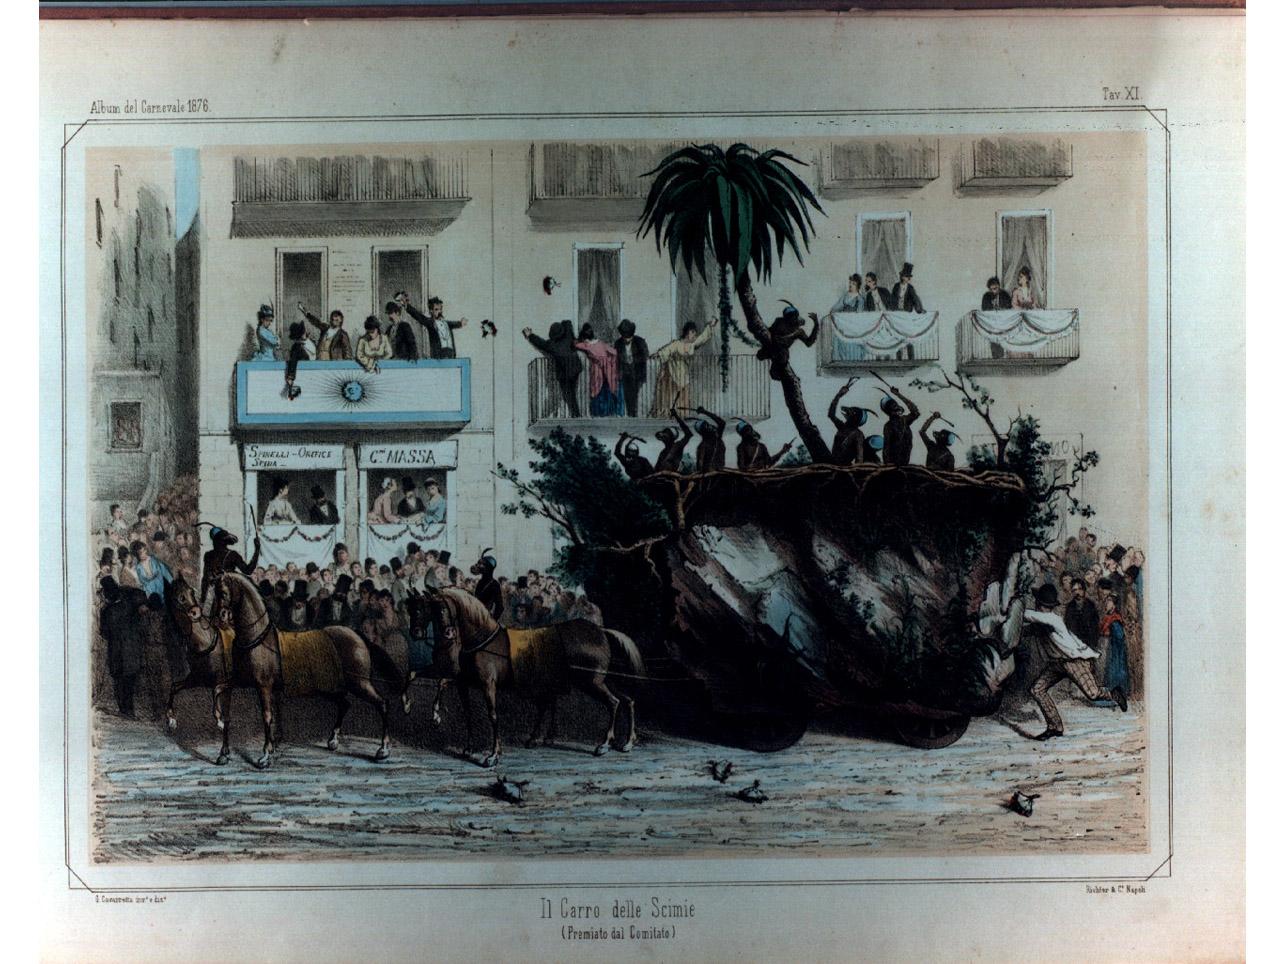 carro carnevalesco (stampa a colori, elemento d'insieme) di Richter Ludwig, Cavarretta Giuseppe (sec. XIX)